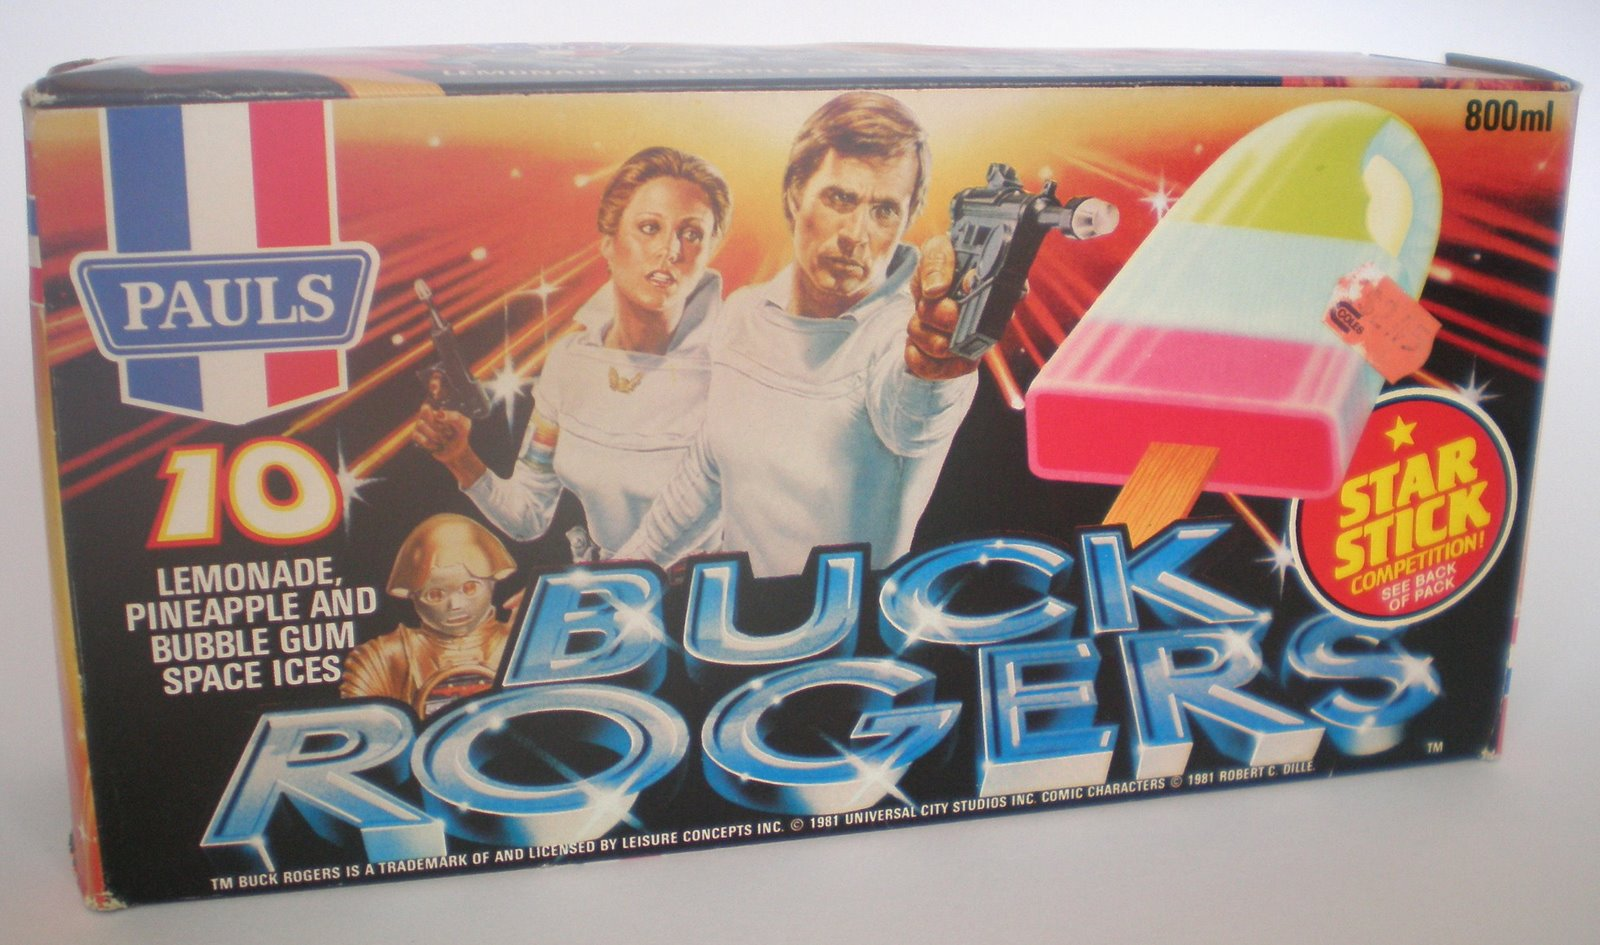 030507 022 728702 Vintage Buck Rogers Australian Ice Creams